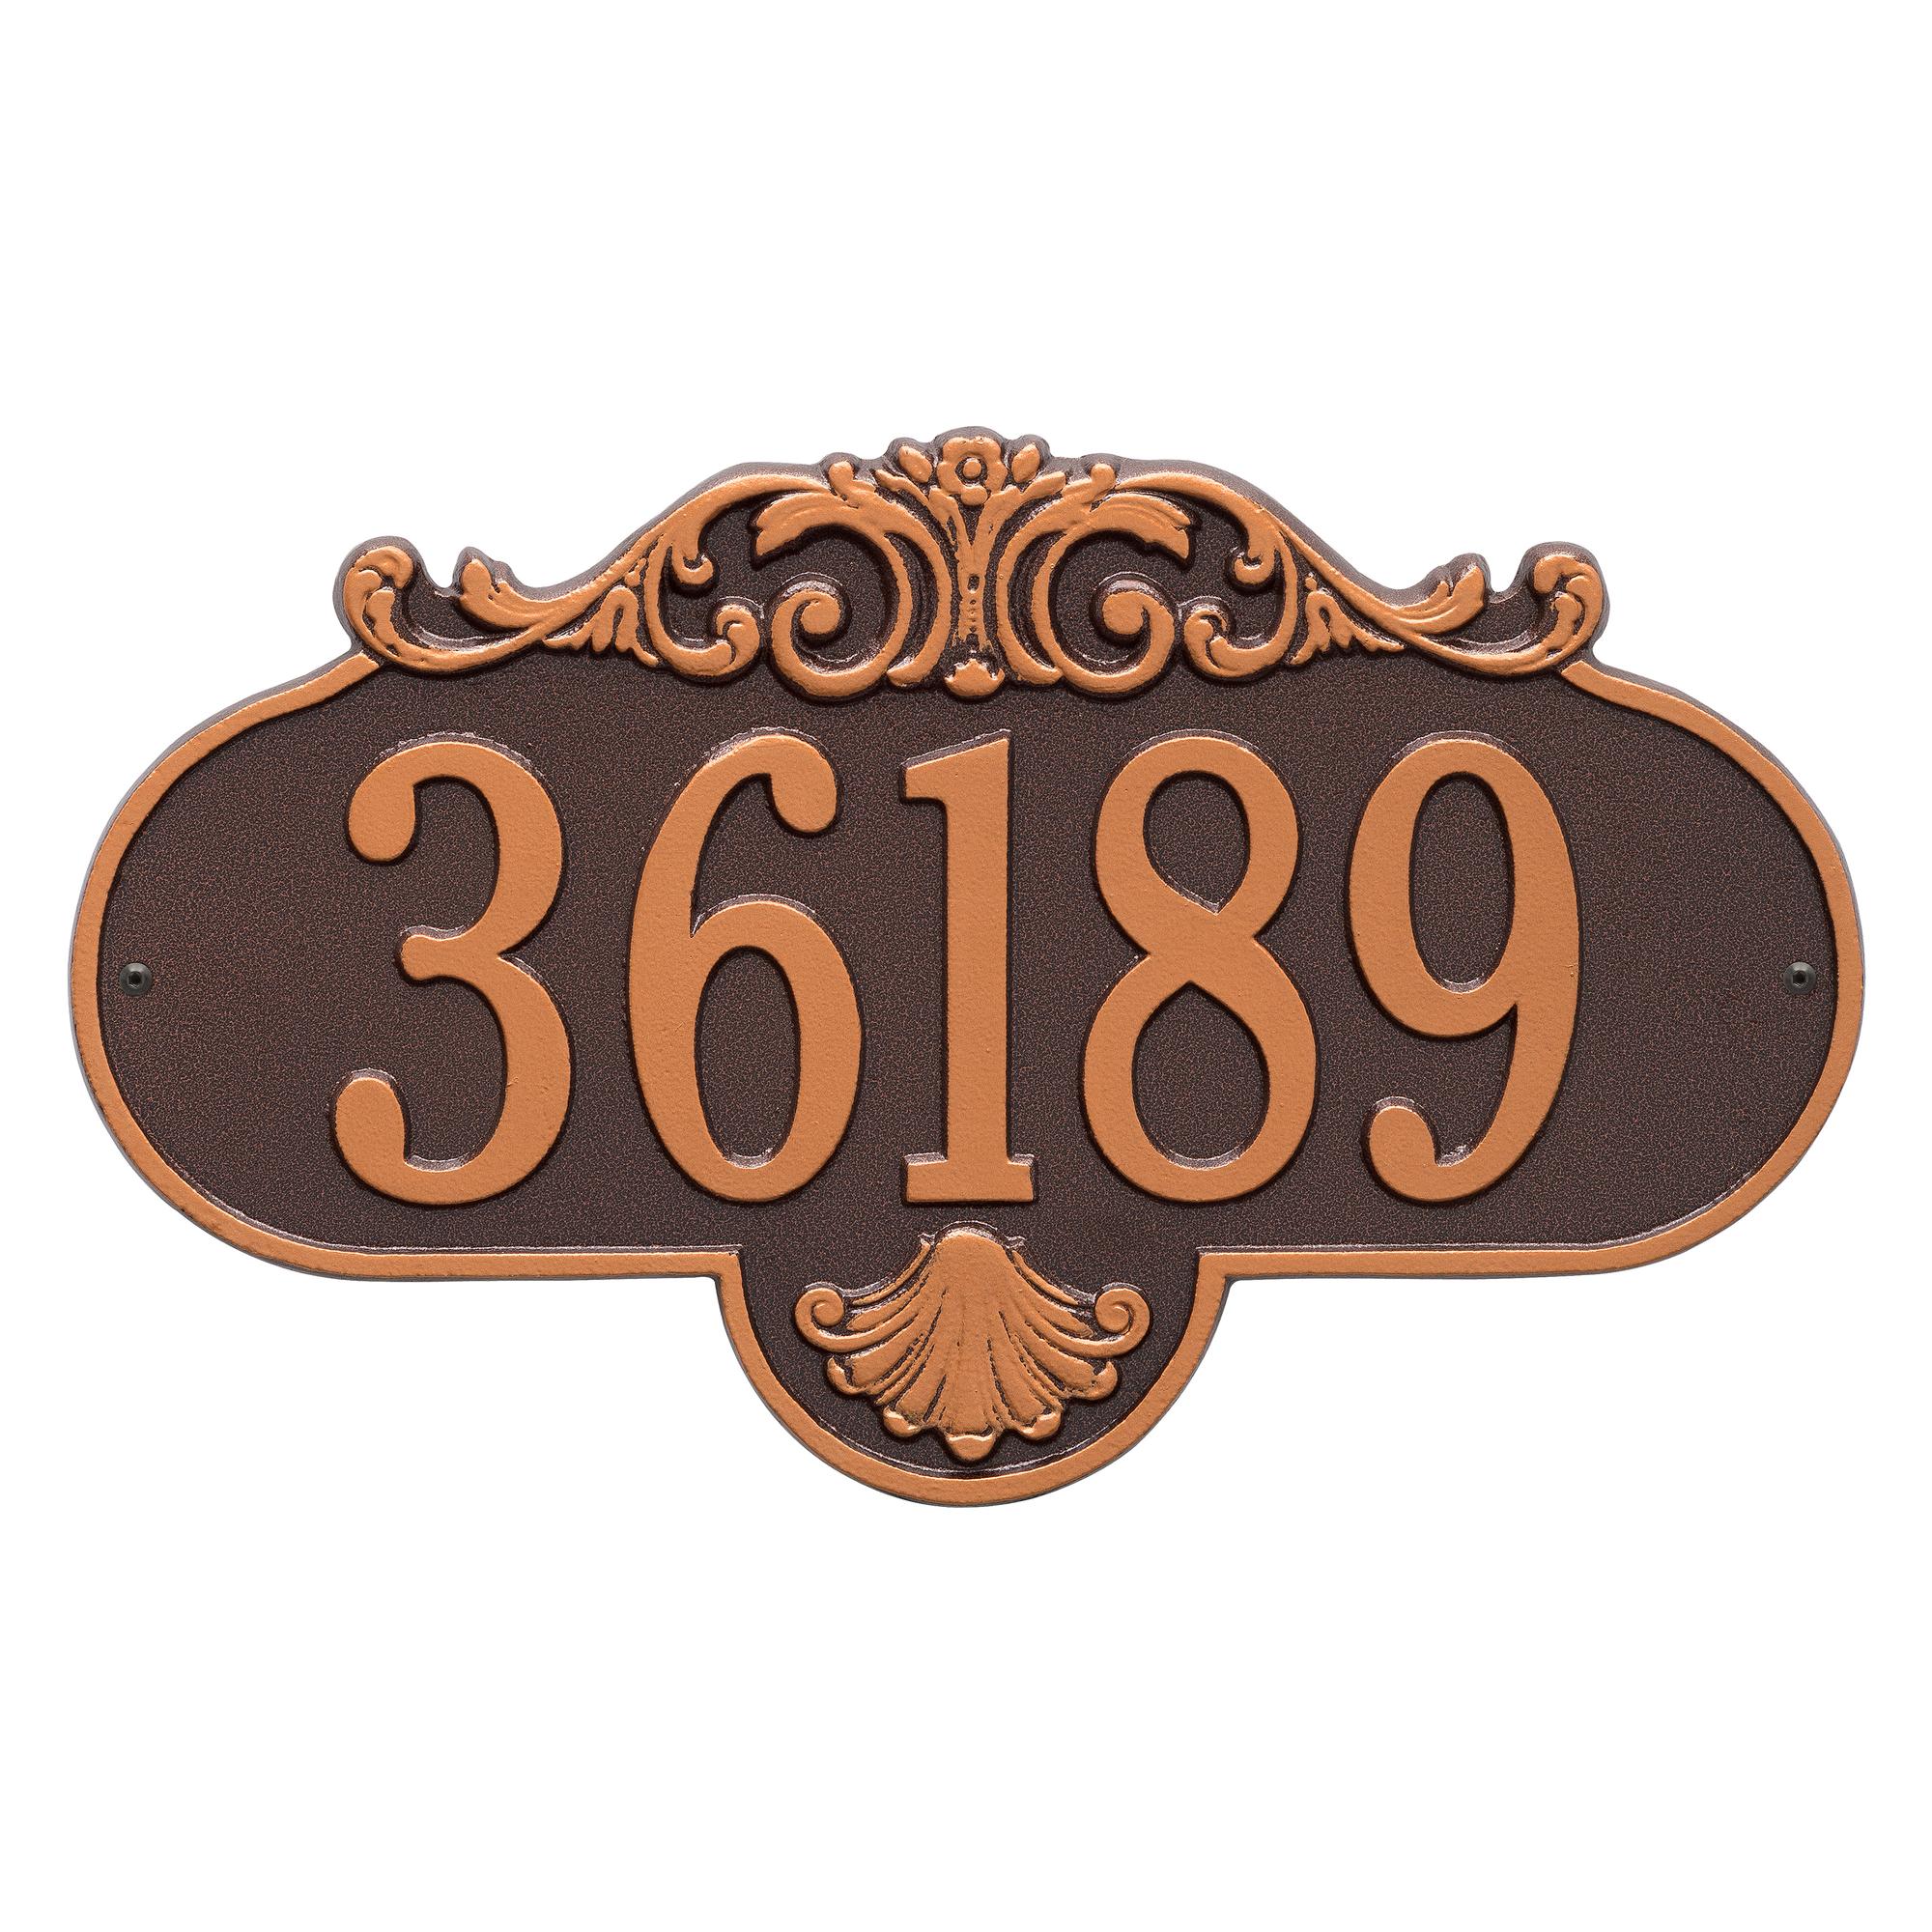 Personalized Rochelle 1-Line Grande Wall Plaque in Antique Copper